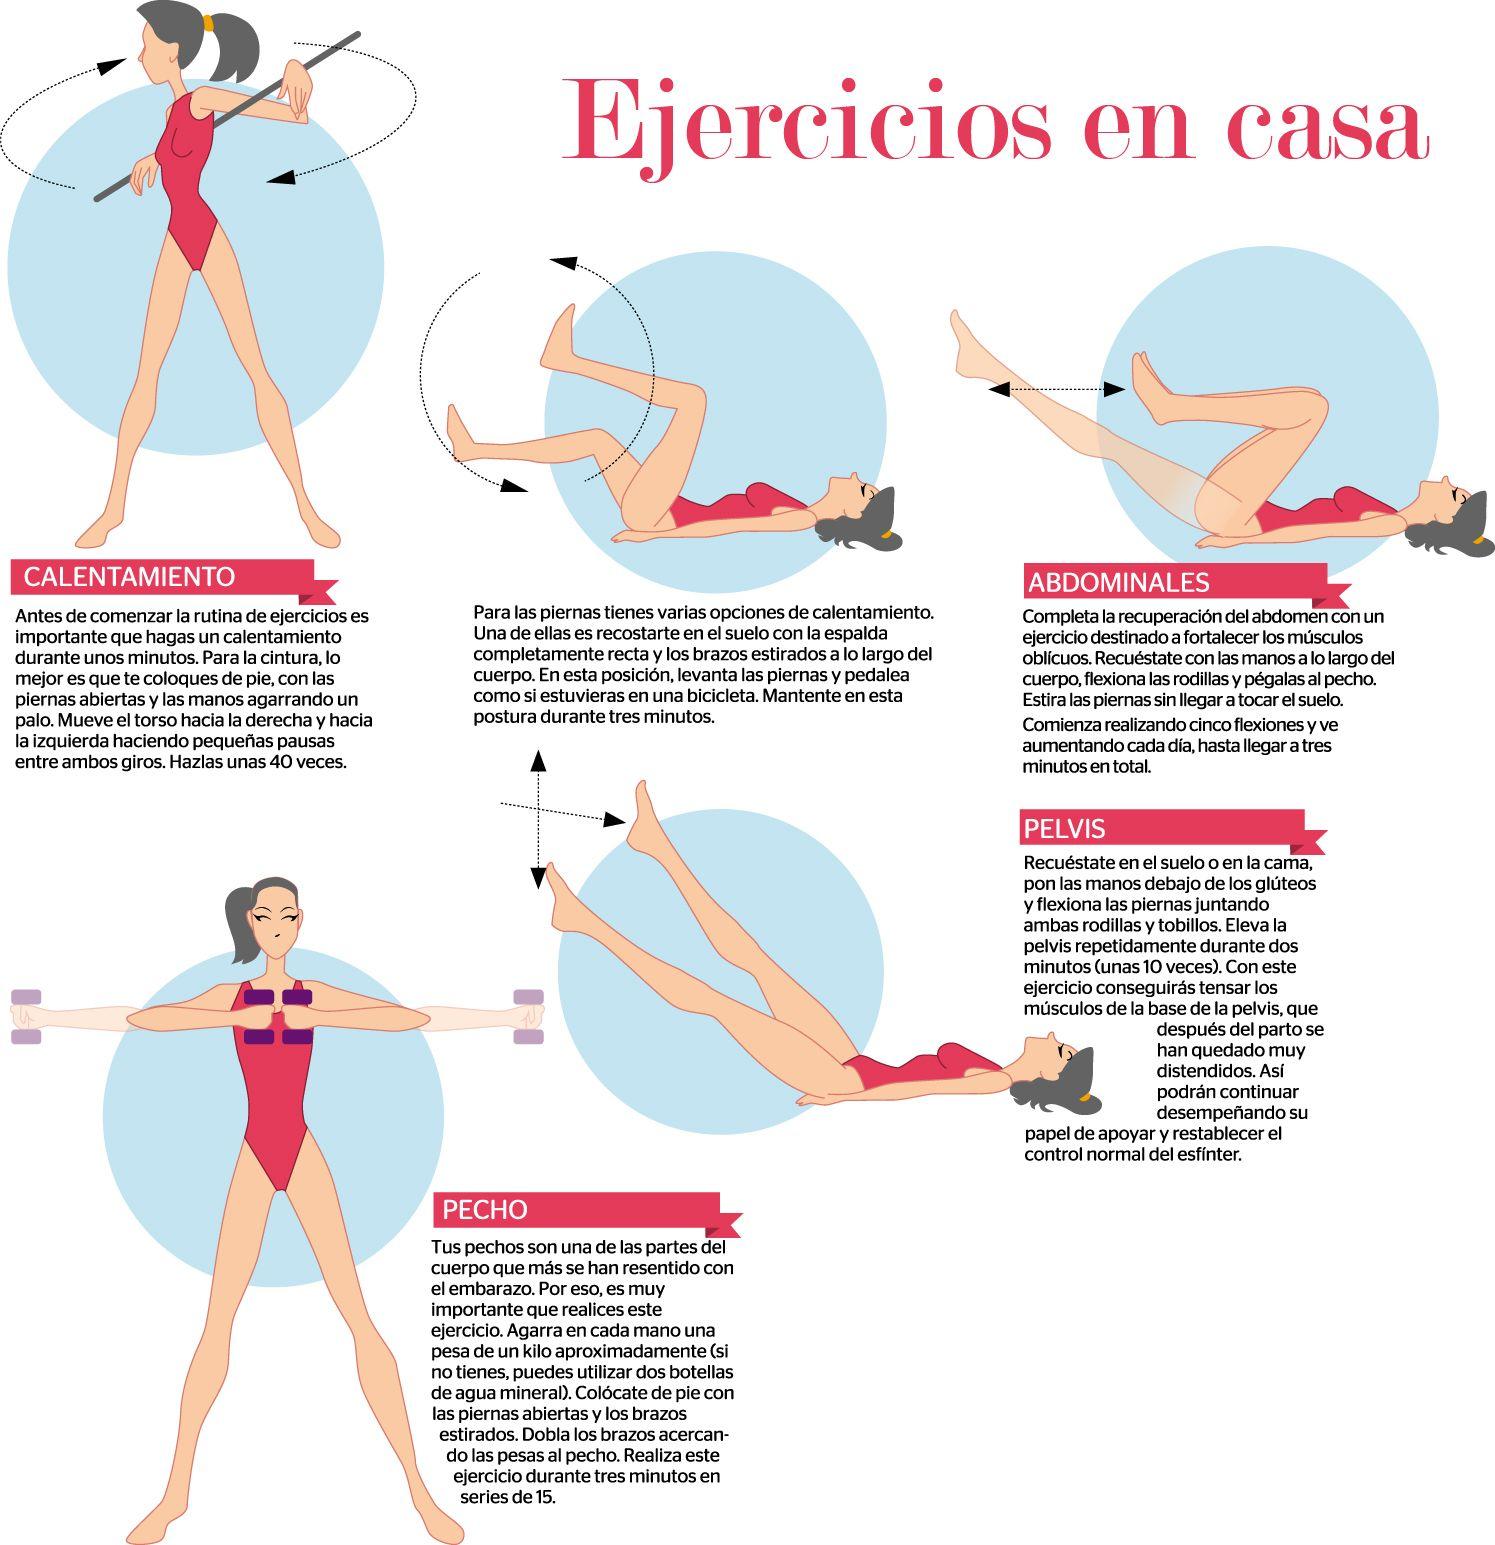 Los Mejores Ejercicios Para Bajardepeso En Casa Ejerciciosencasa Ejercicio Ejerciciosfáciles Fun Workouts Fitness Body Fitness Training